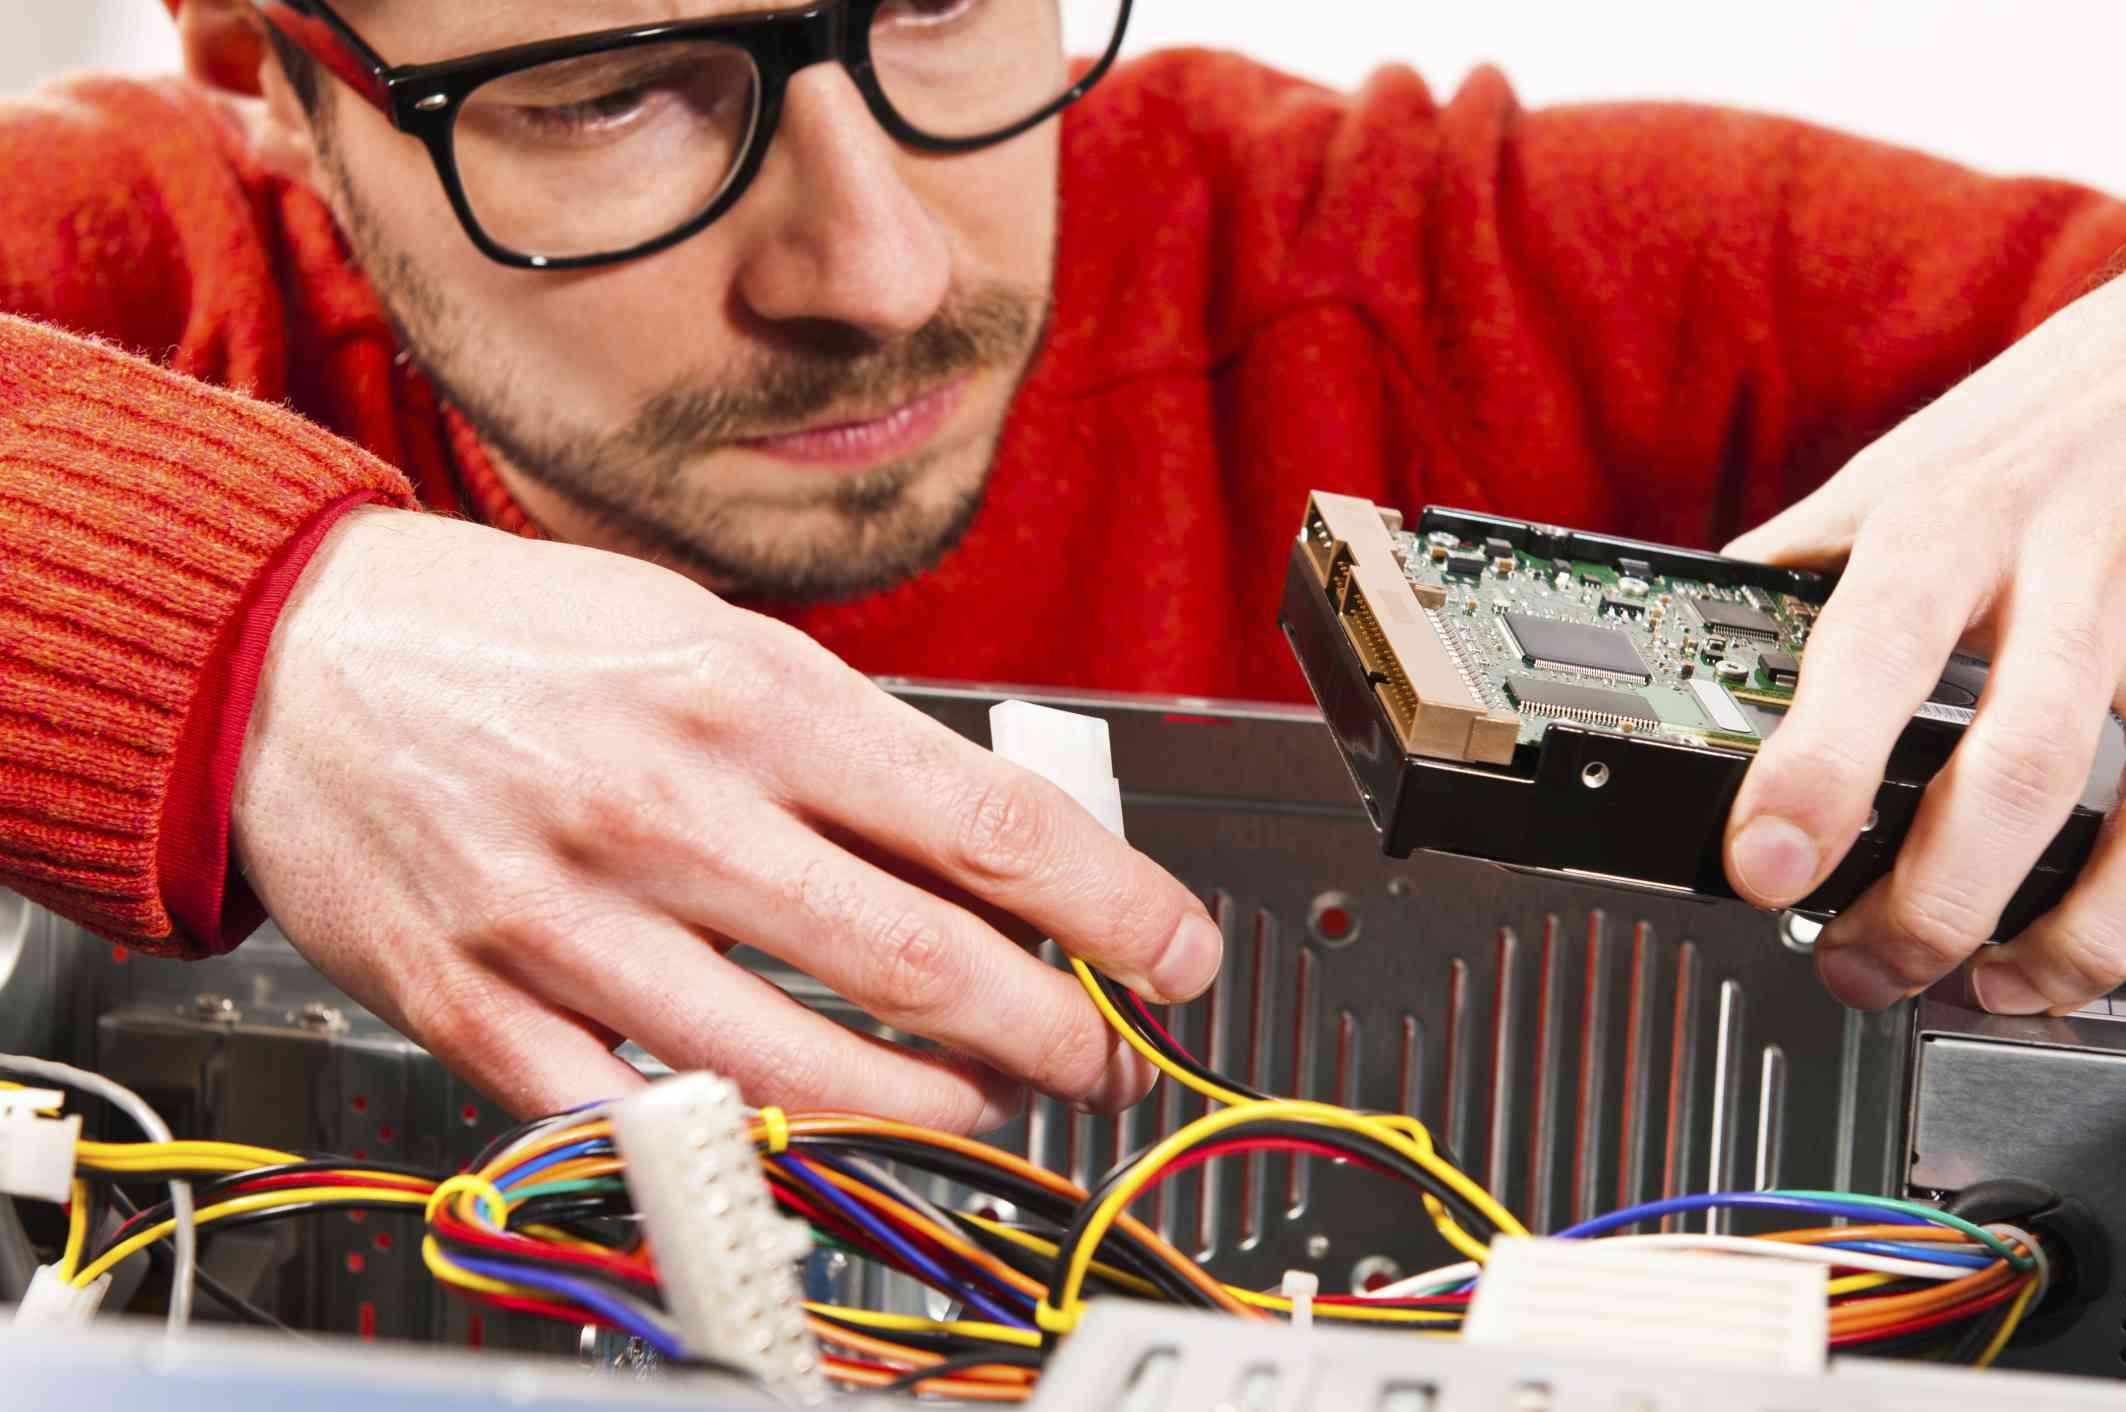 Photo of a man fixing a desktop computer